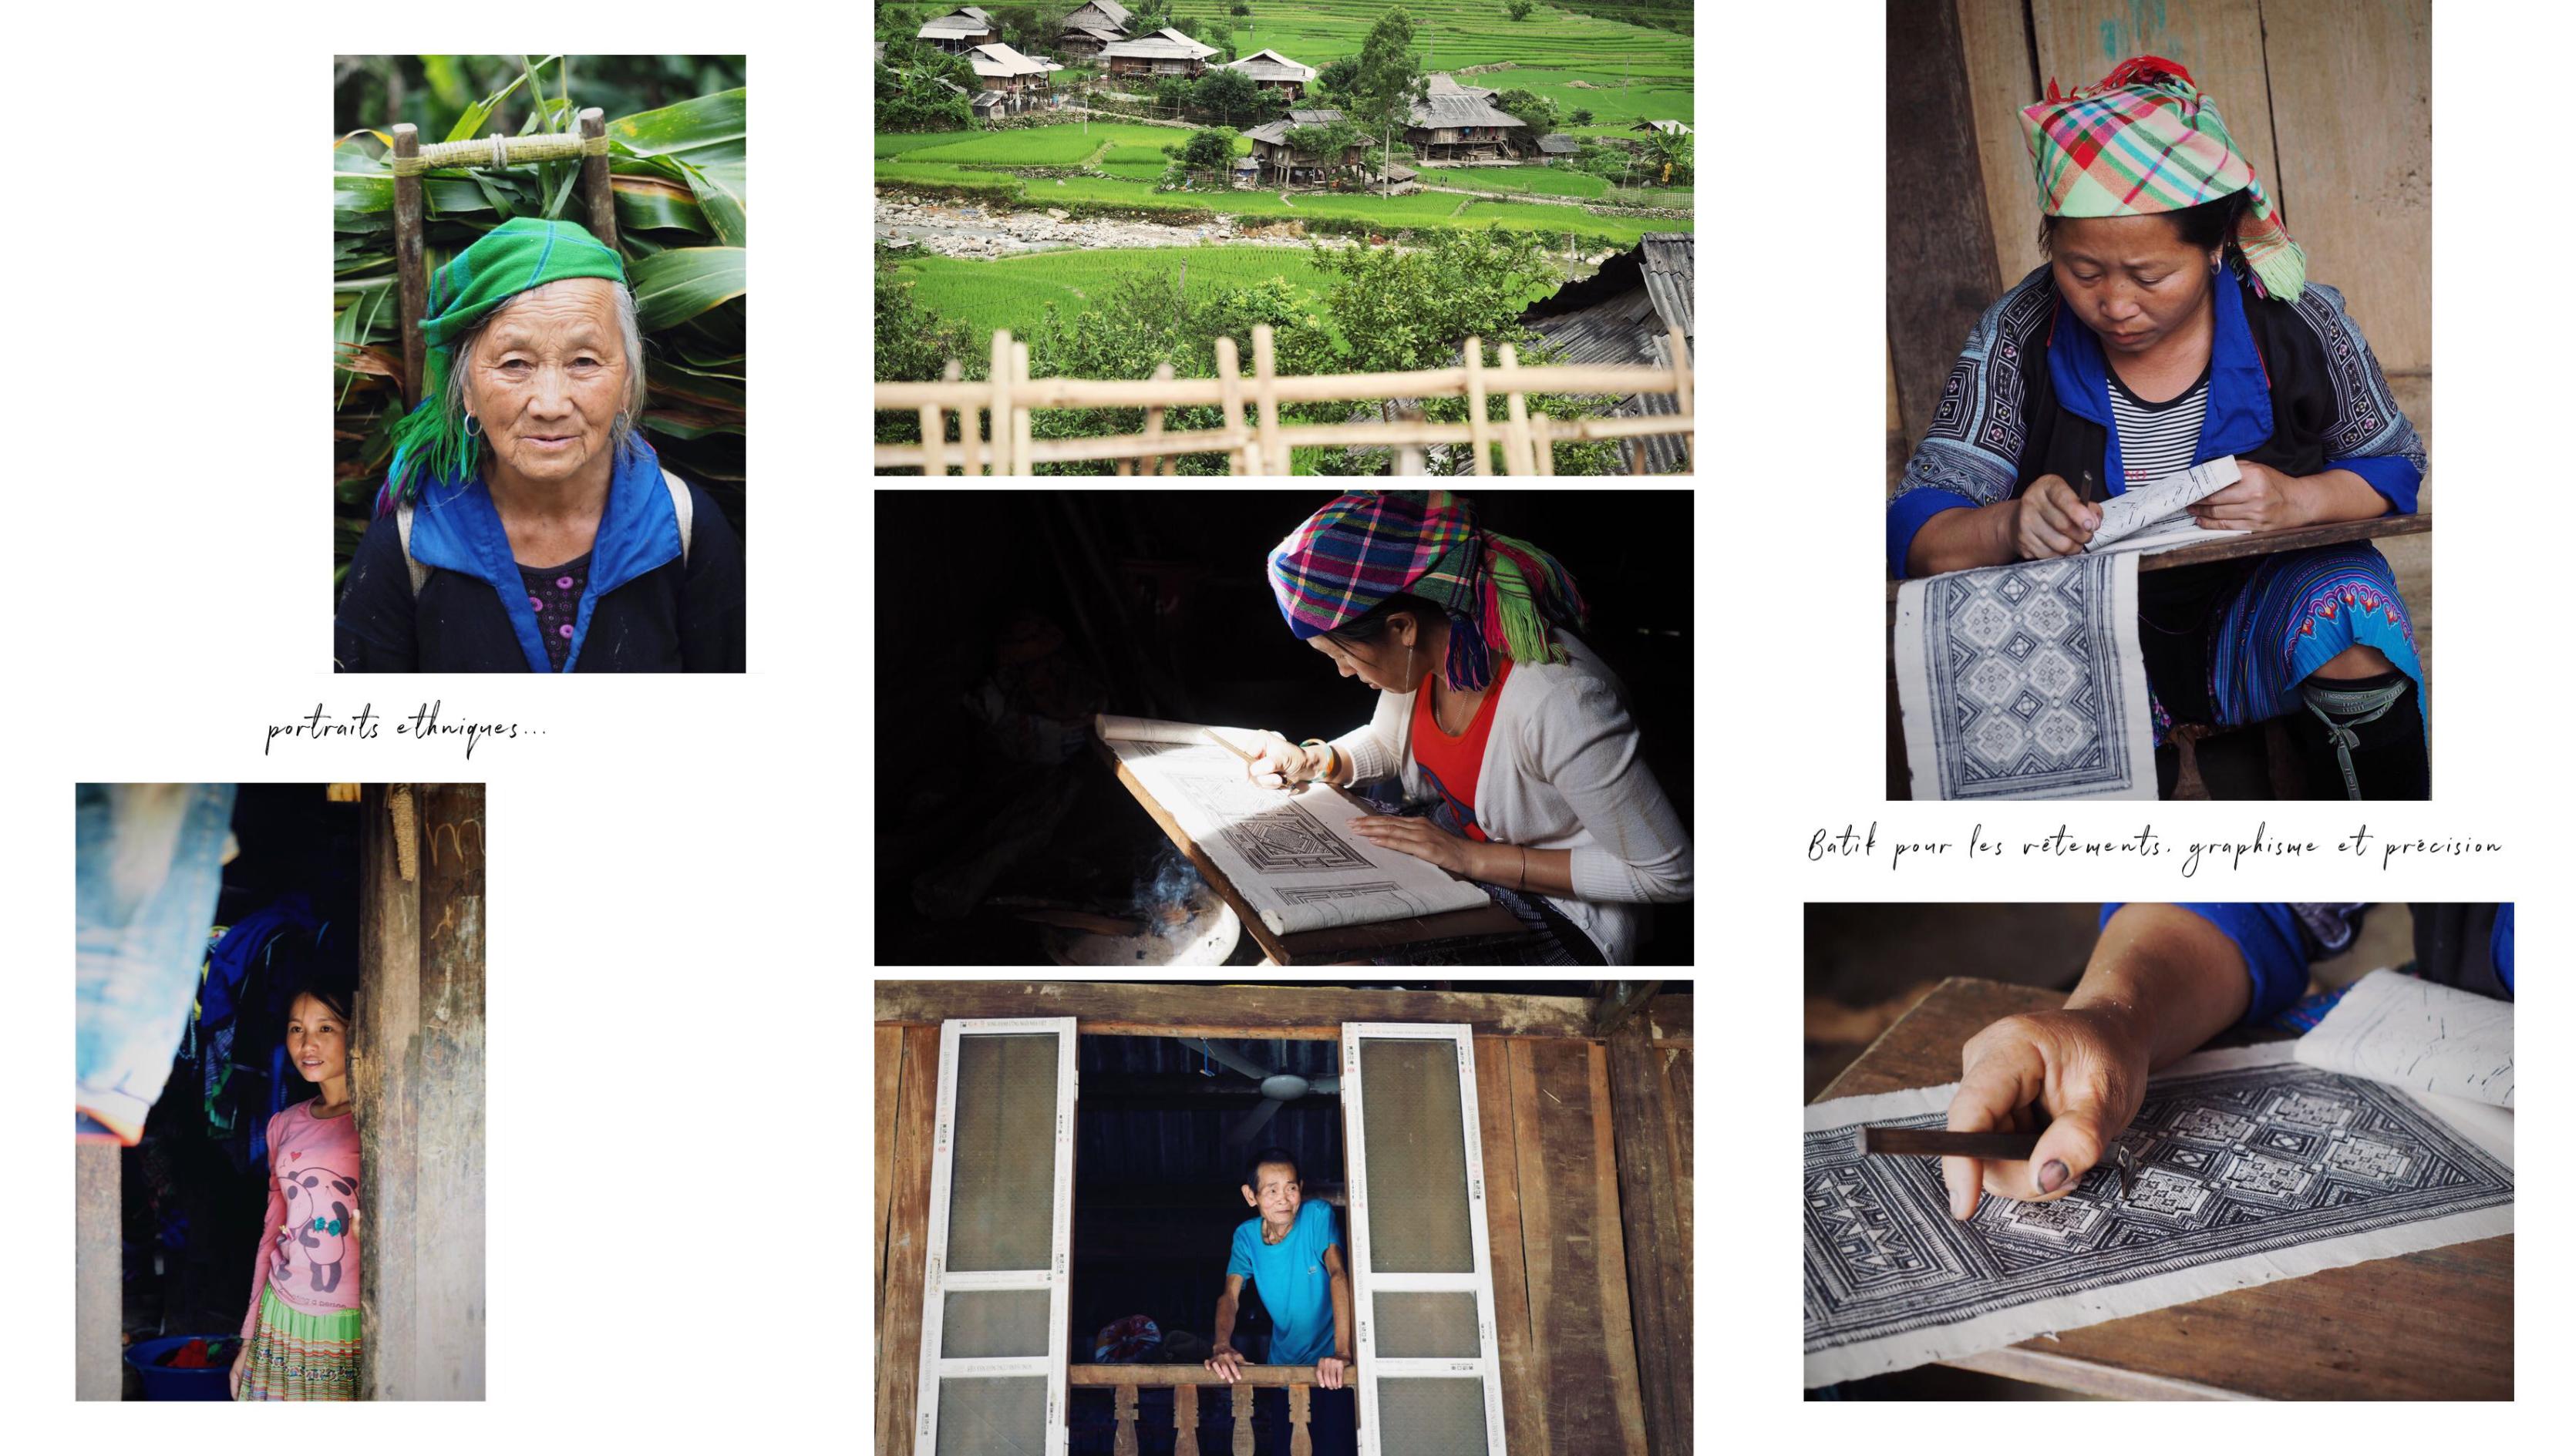 vietnam - montagnes du nord - ethnies minoritaires - asie - journal du vietnam